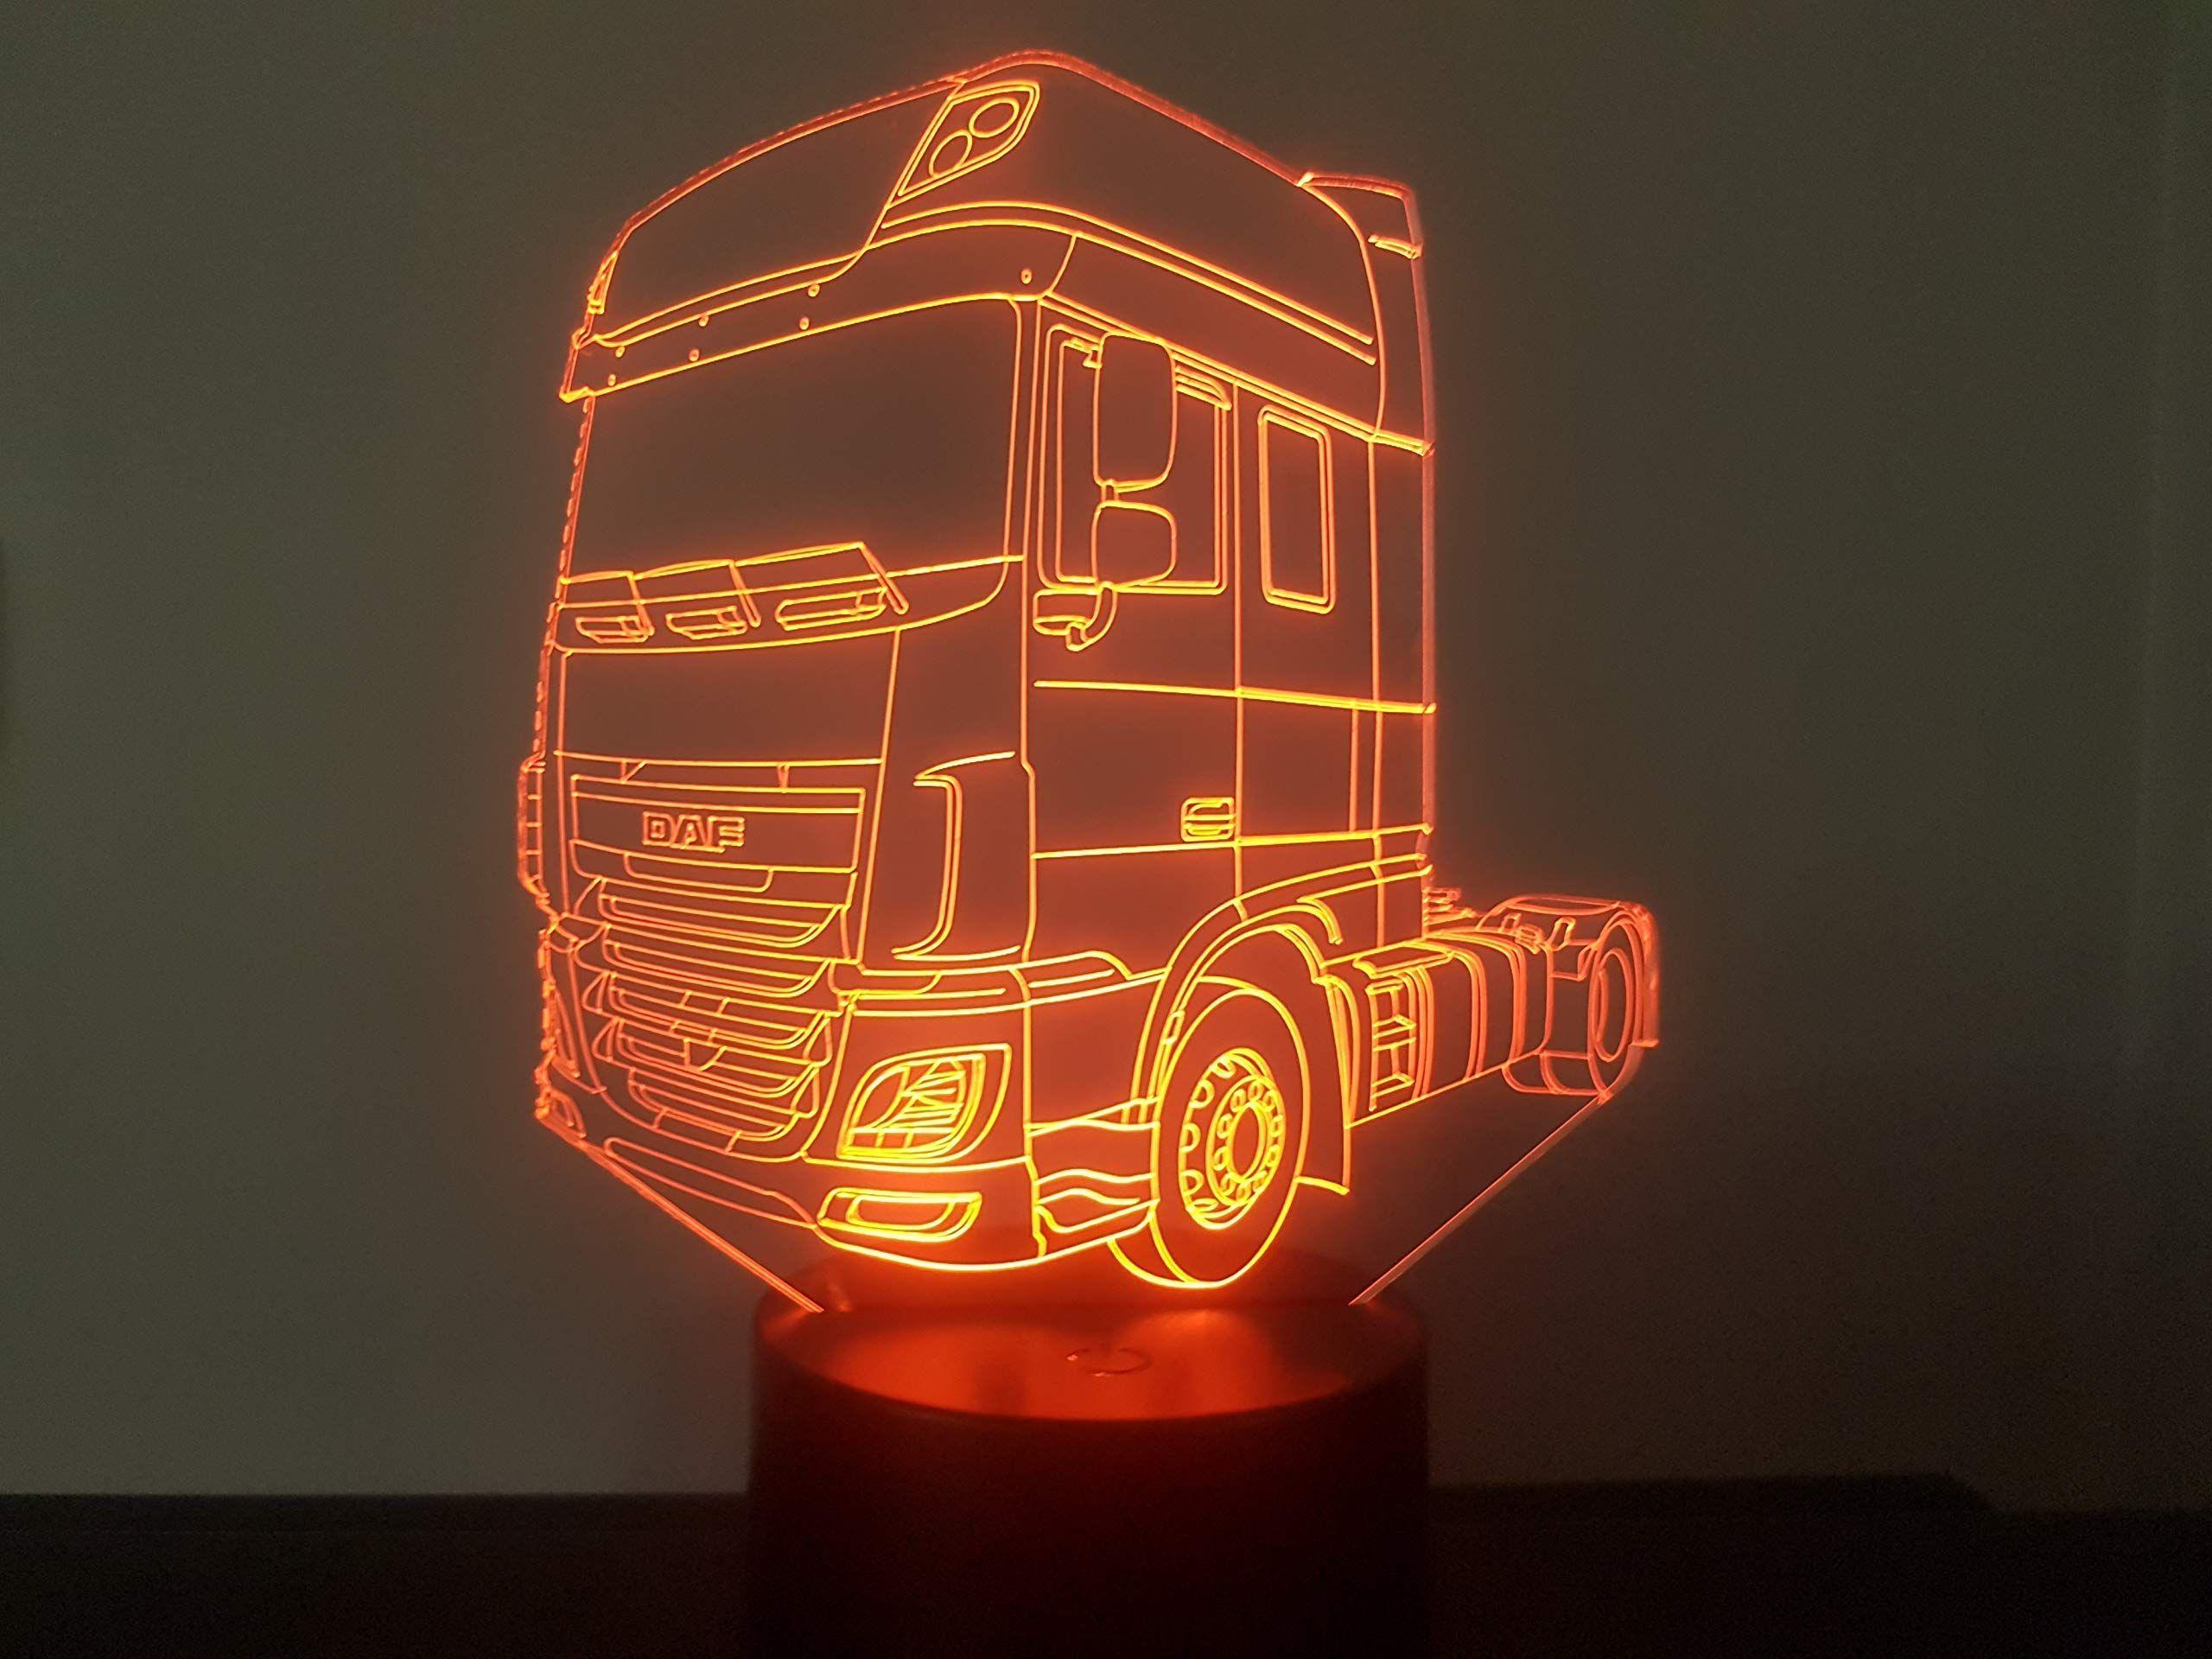 Lkw Daf Xf 106 3d Lampe Led Xf Daf Lkw Led Lkw Daf